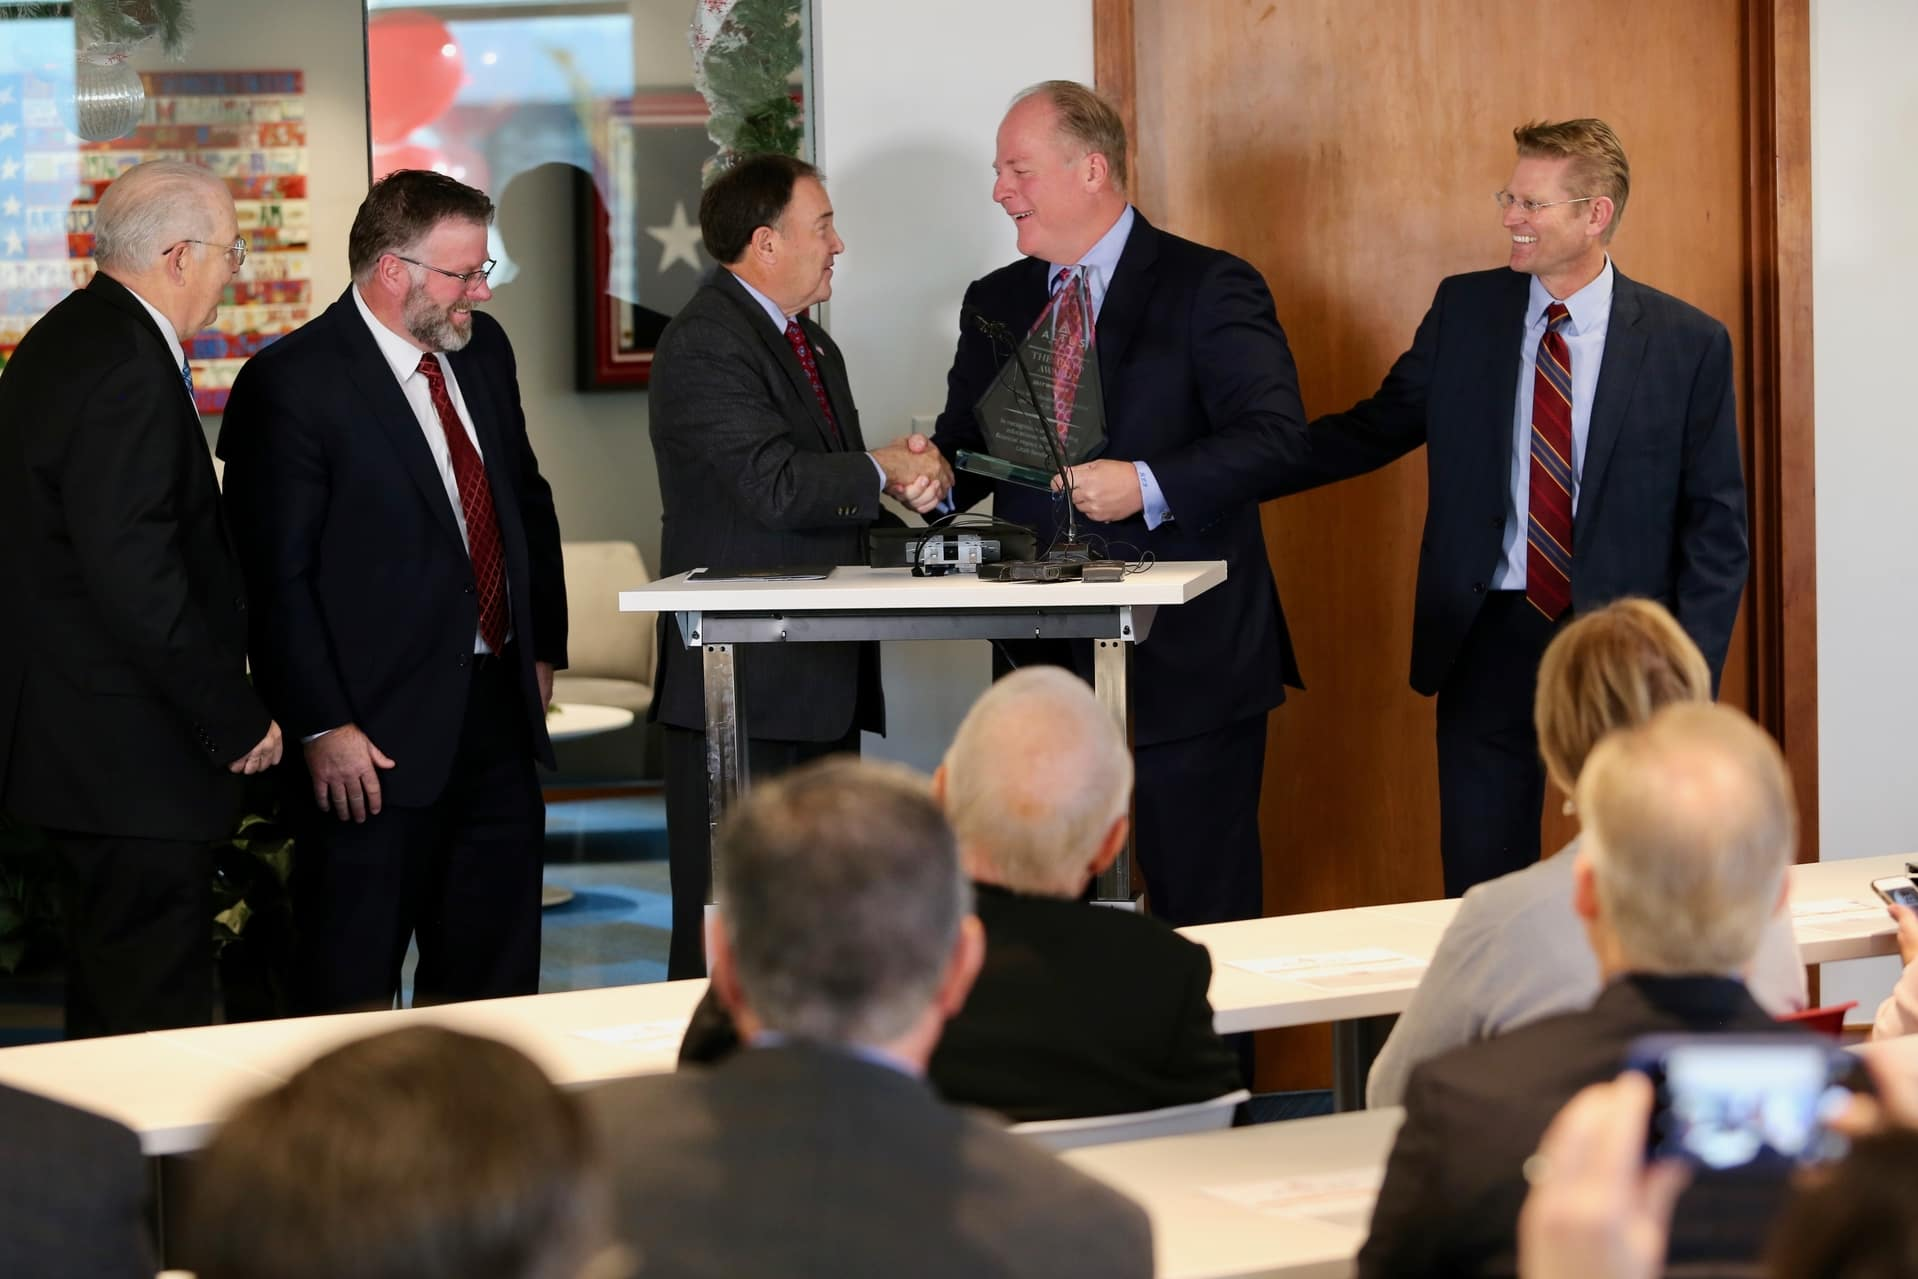 Ken Garff Dodge >> Ken Garff Charity Awarded 2017 Altus Award by Governor Herbert | Ken Garff Auto Group